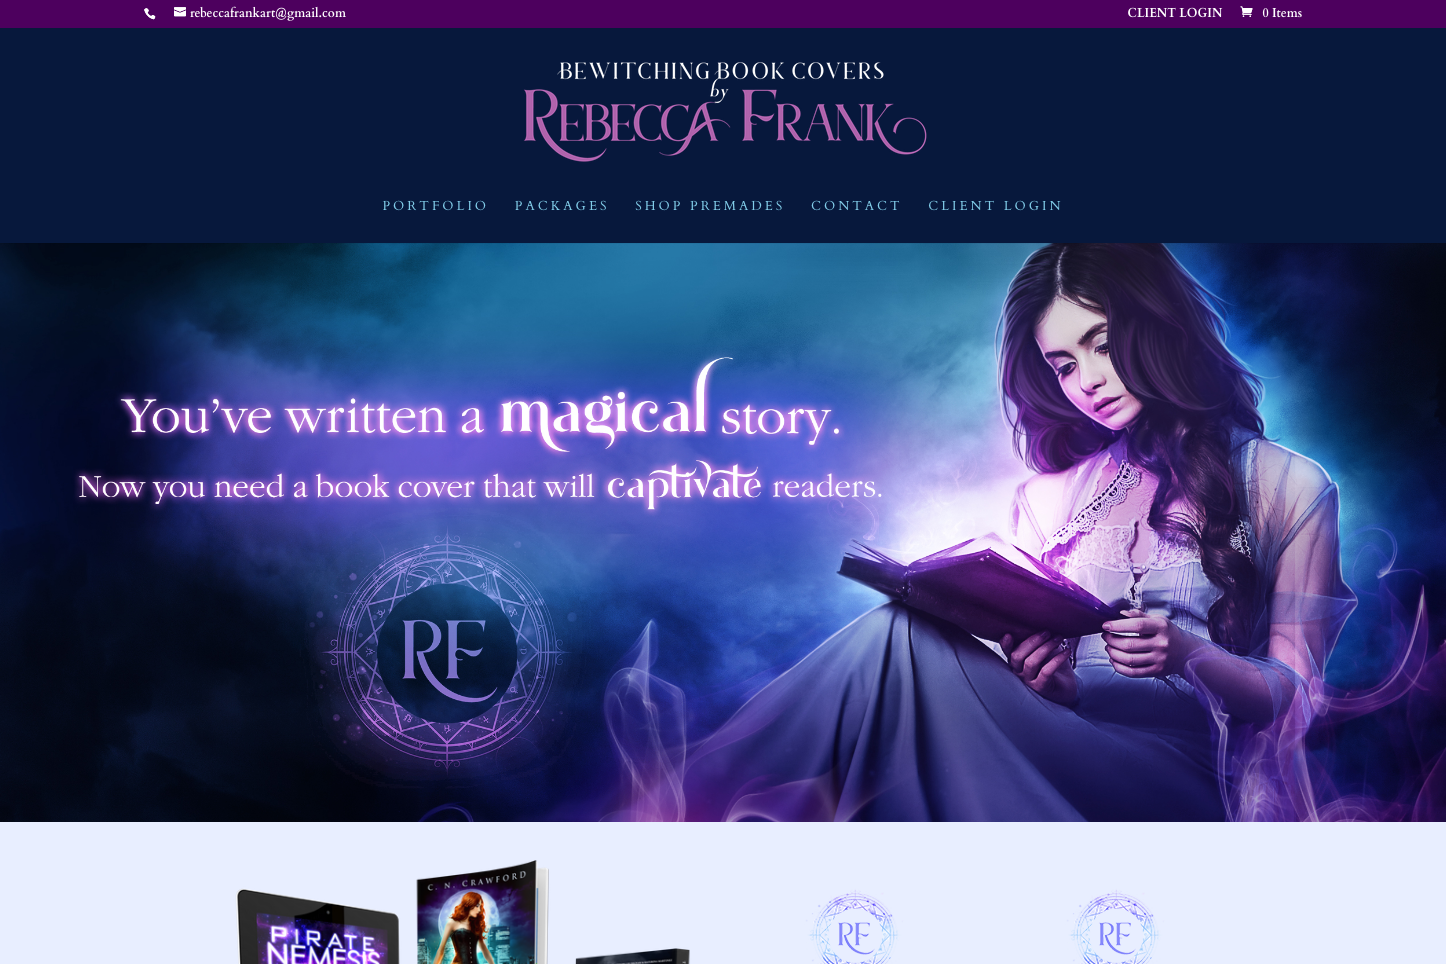 Rebecca Frank Cover Art Website